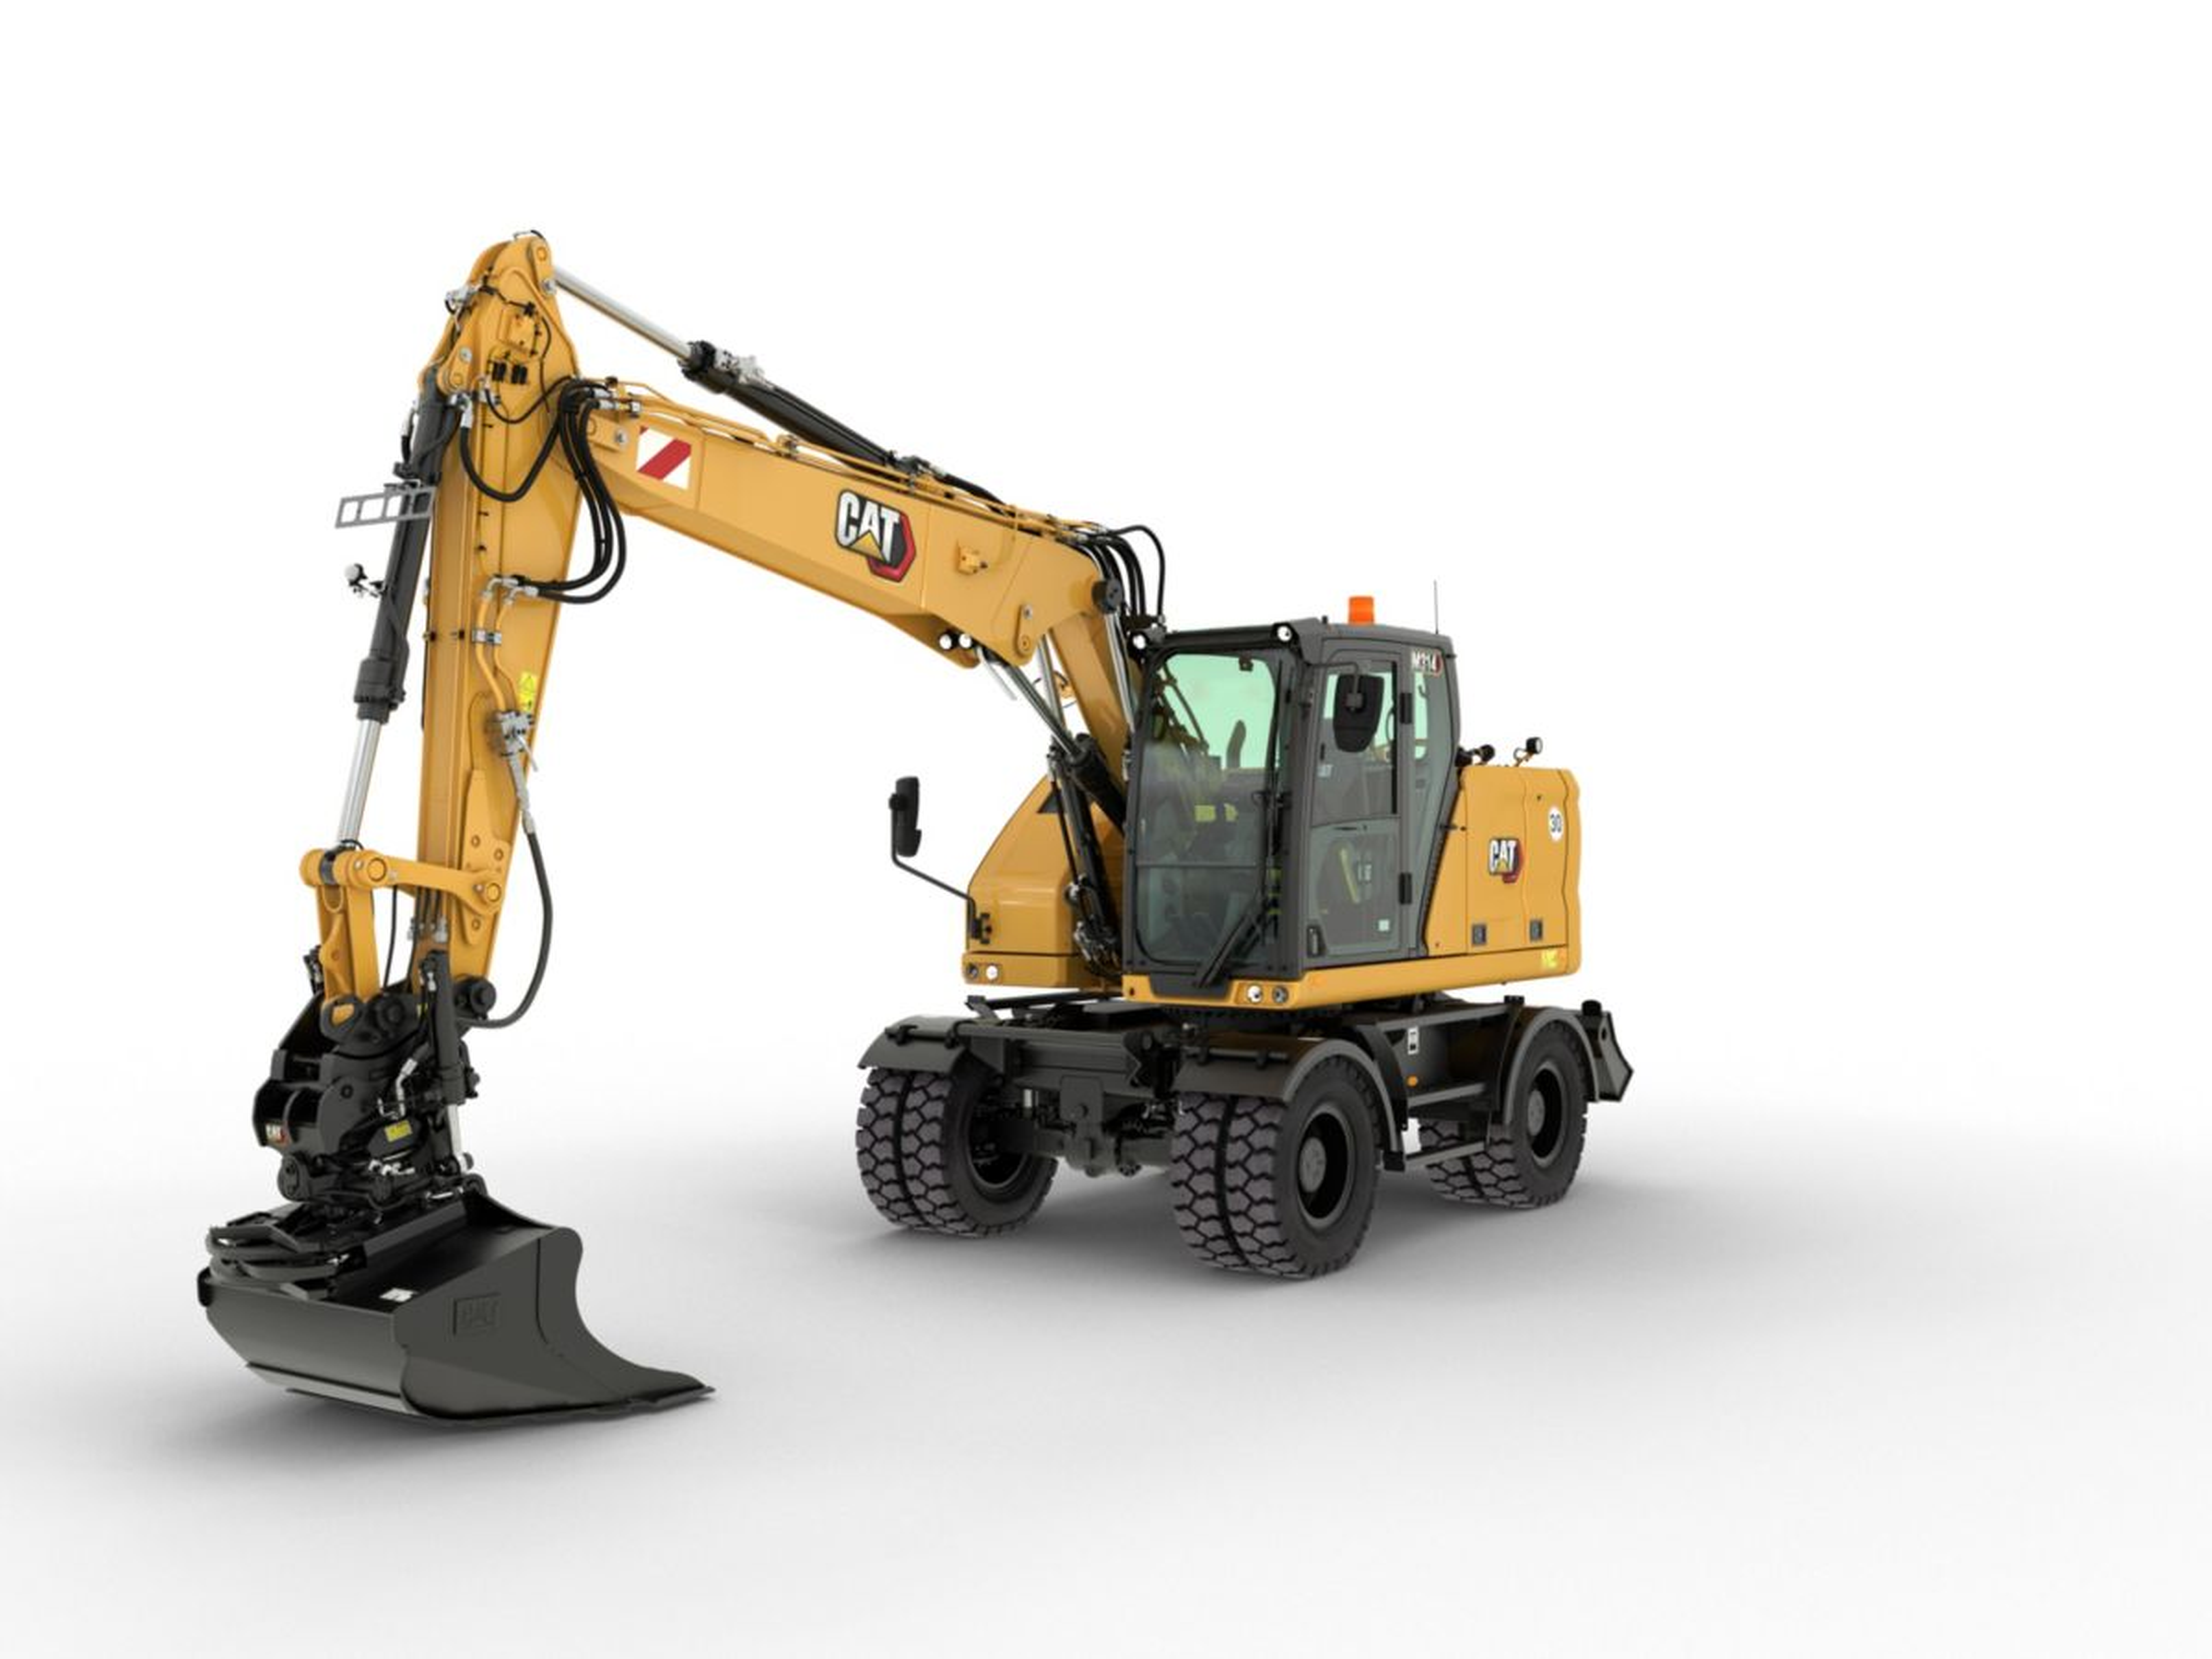 M314 Wheeled Excavator